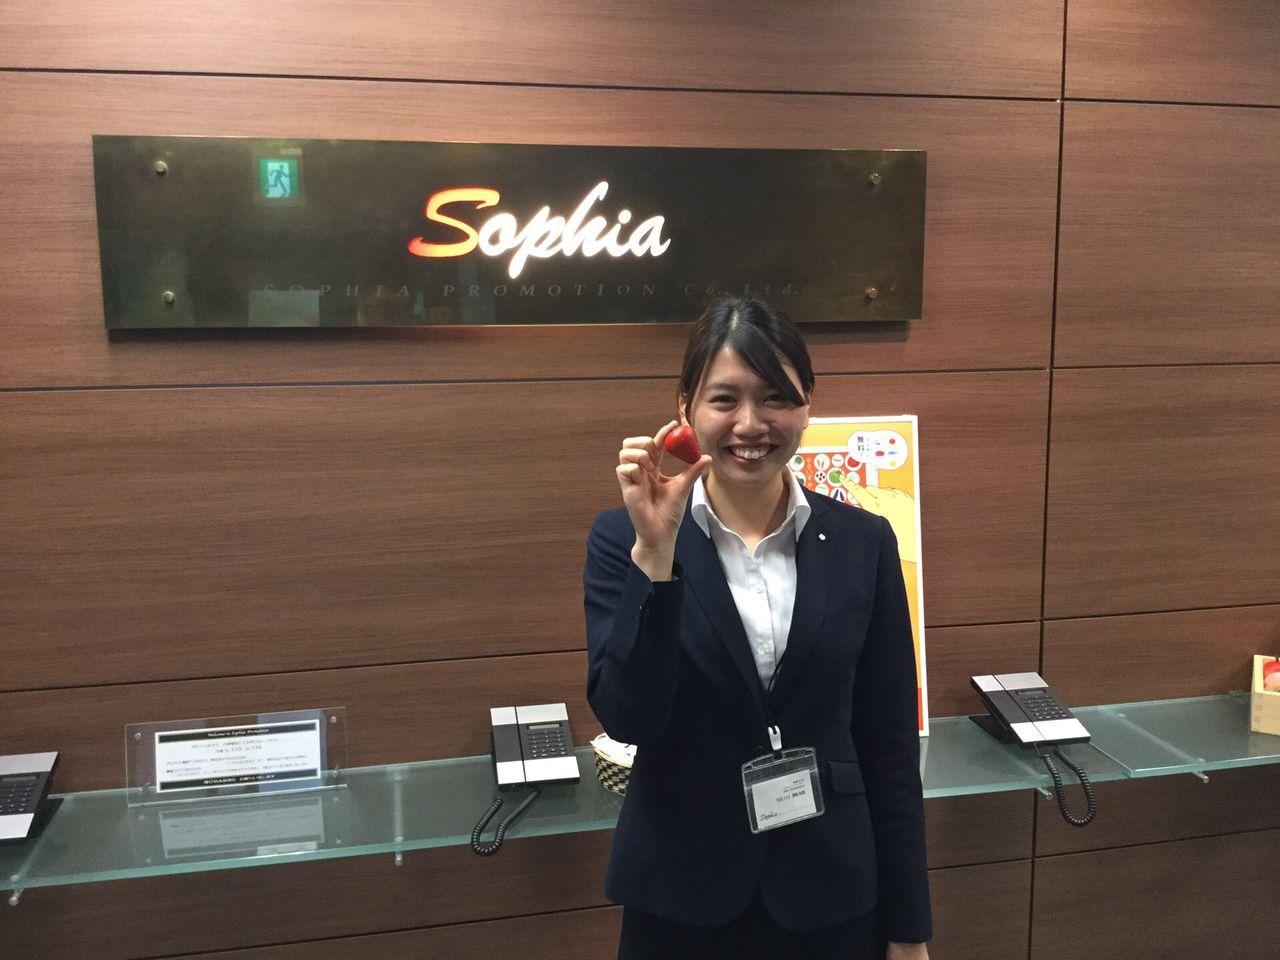 Sophia Promotion Co.,Ltd.  新しいソフィア管理栄養士を3名ご紹介!